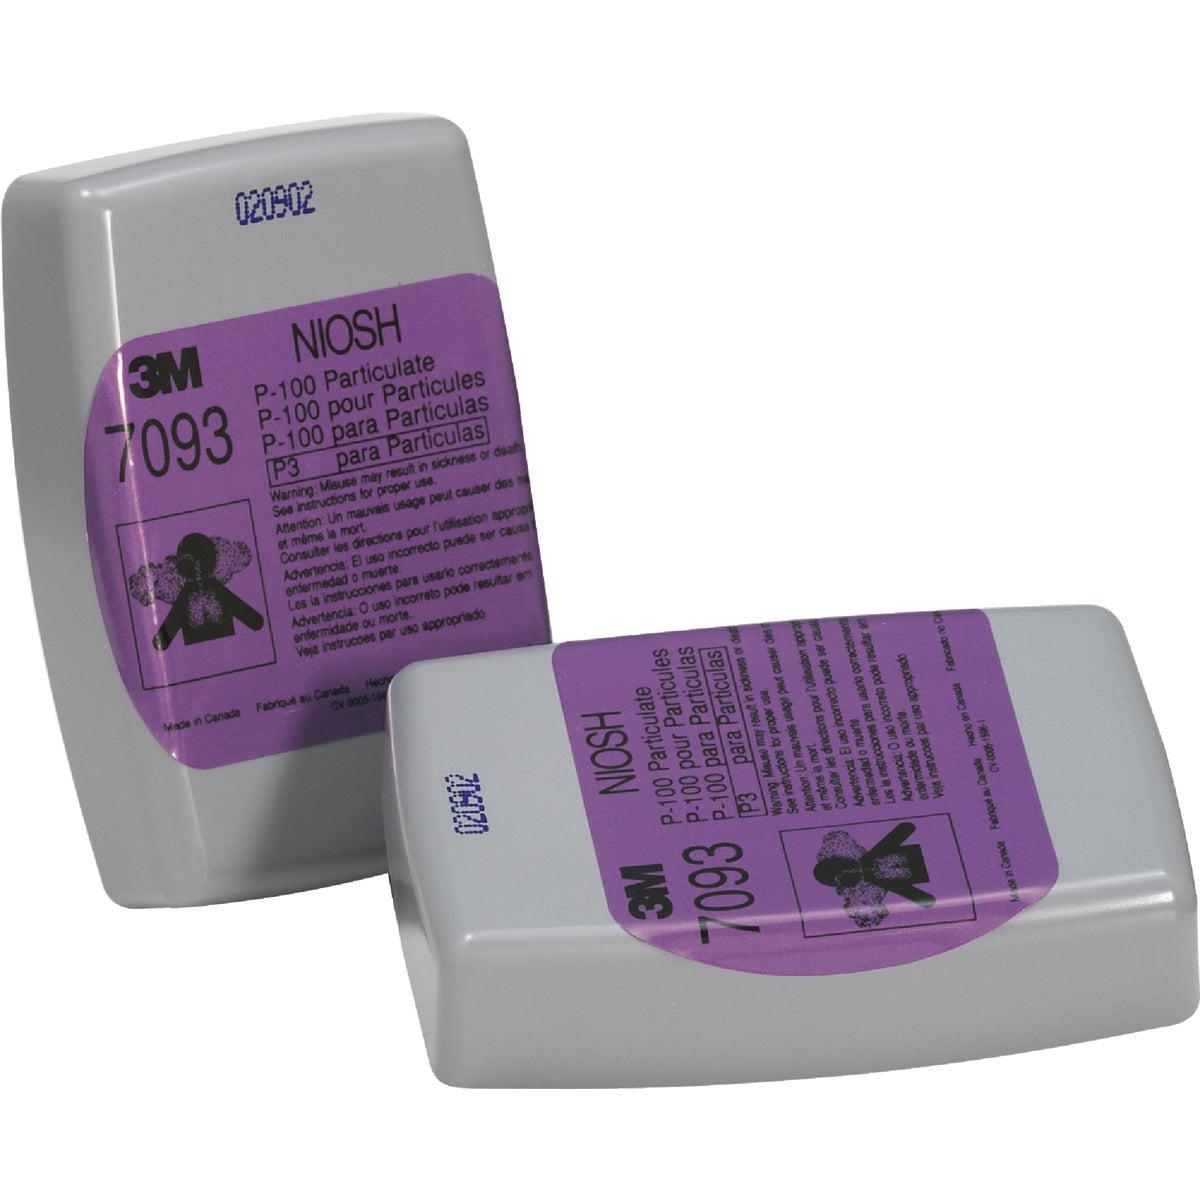 3M Demolition Replacement Filter Cartridge